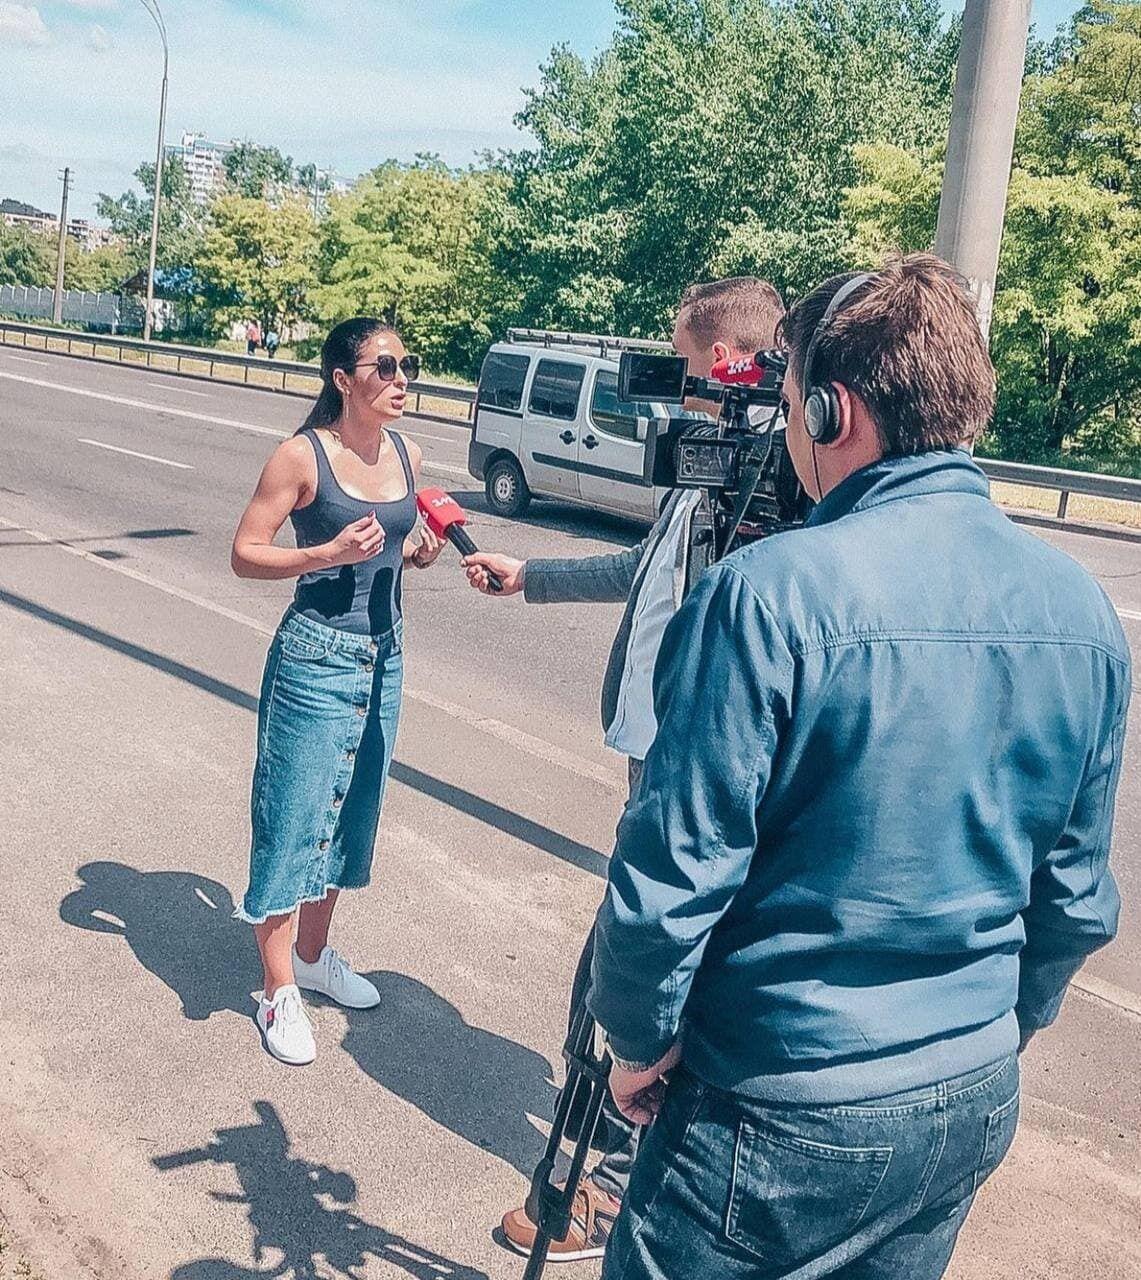 Девушка дала комментарий журналистам об инциденте